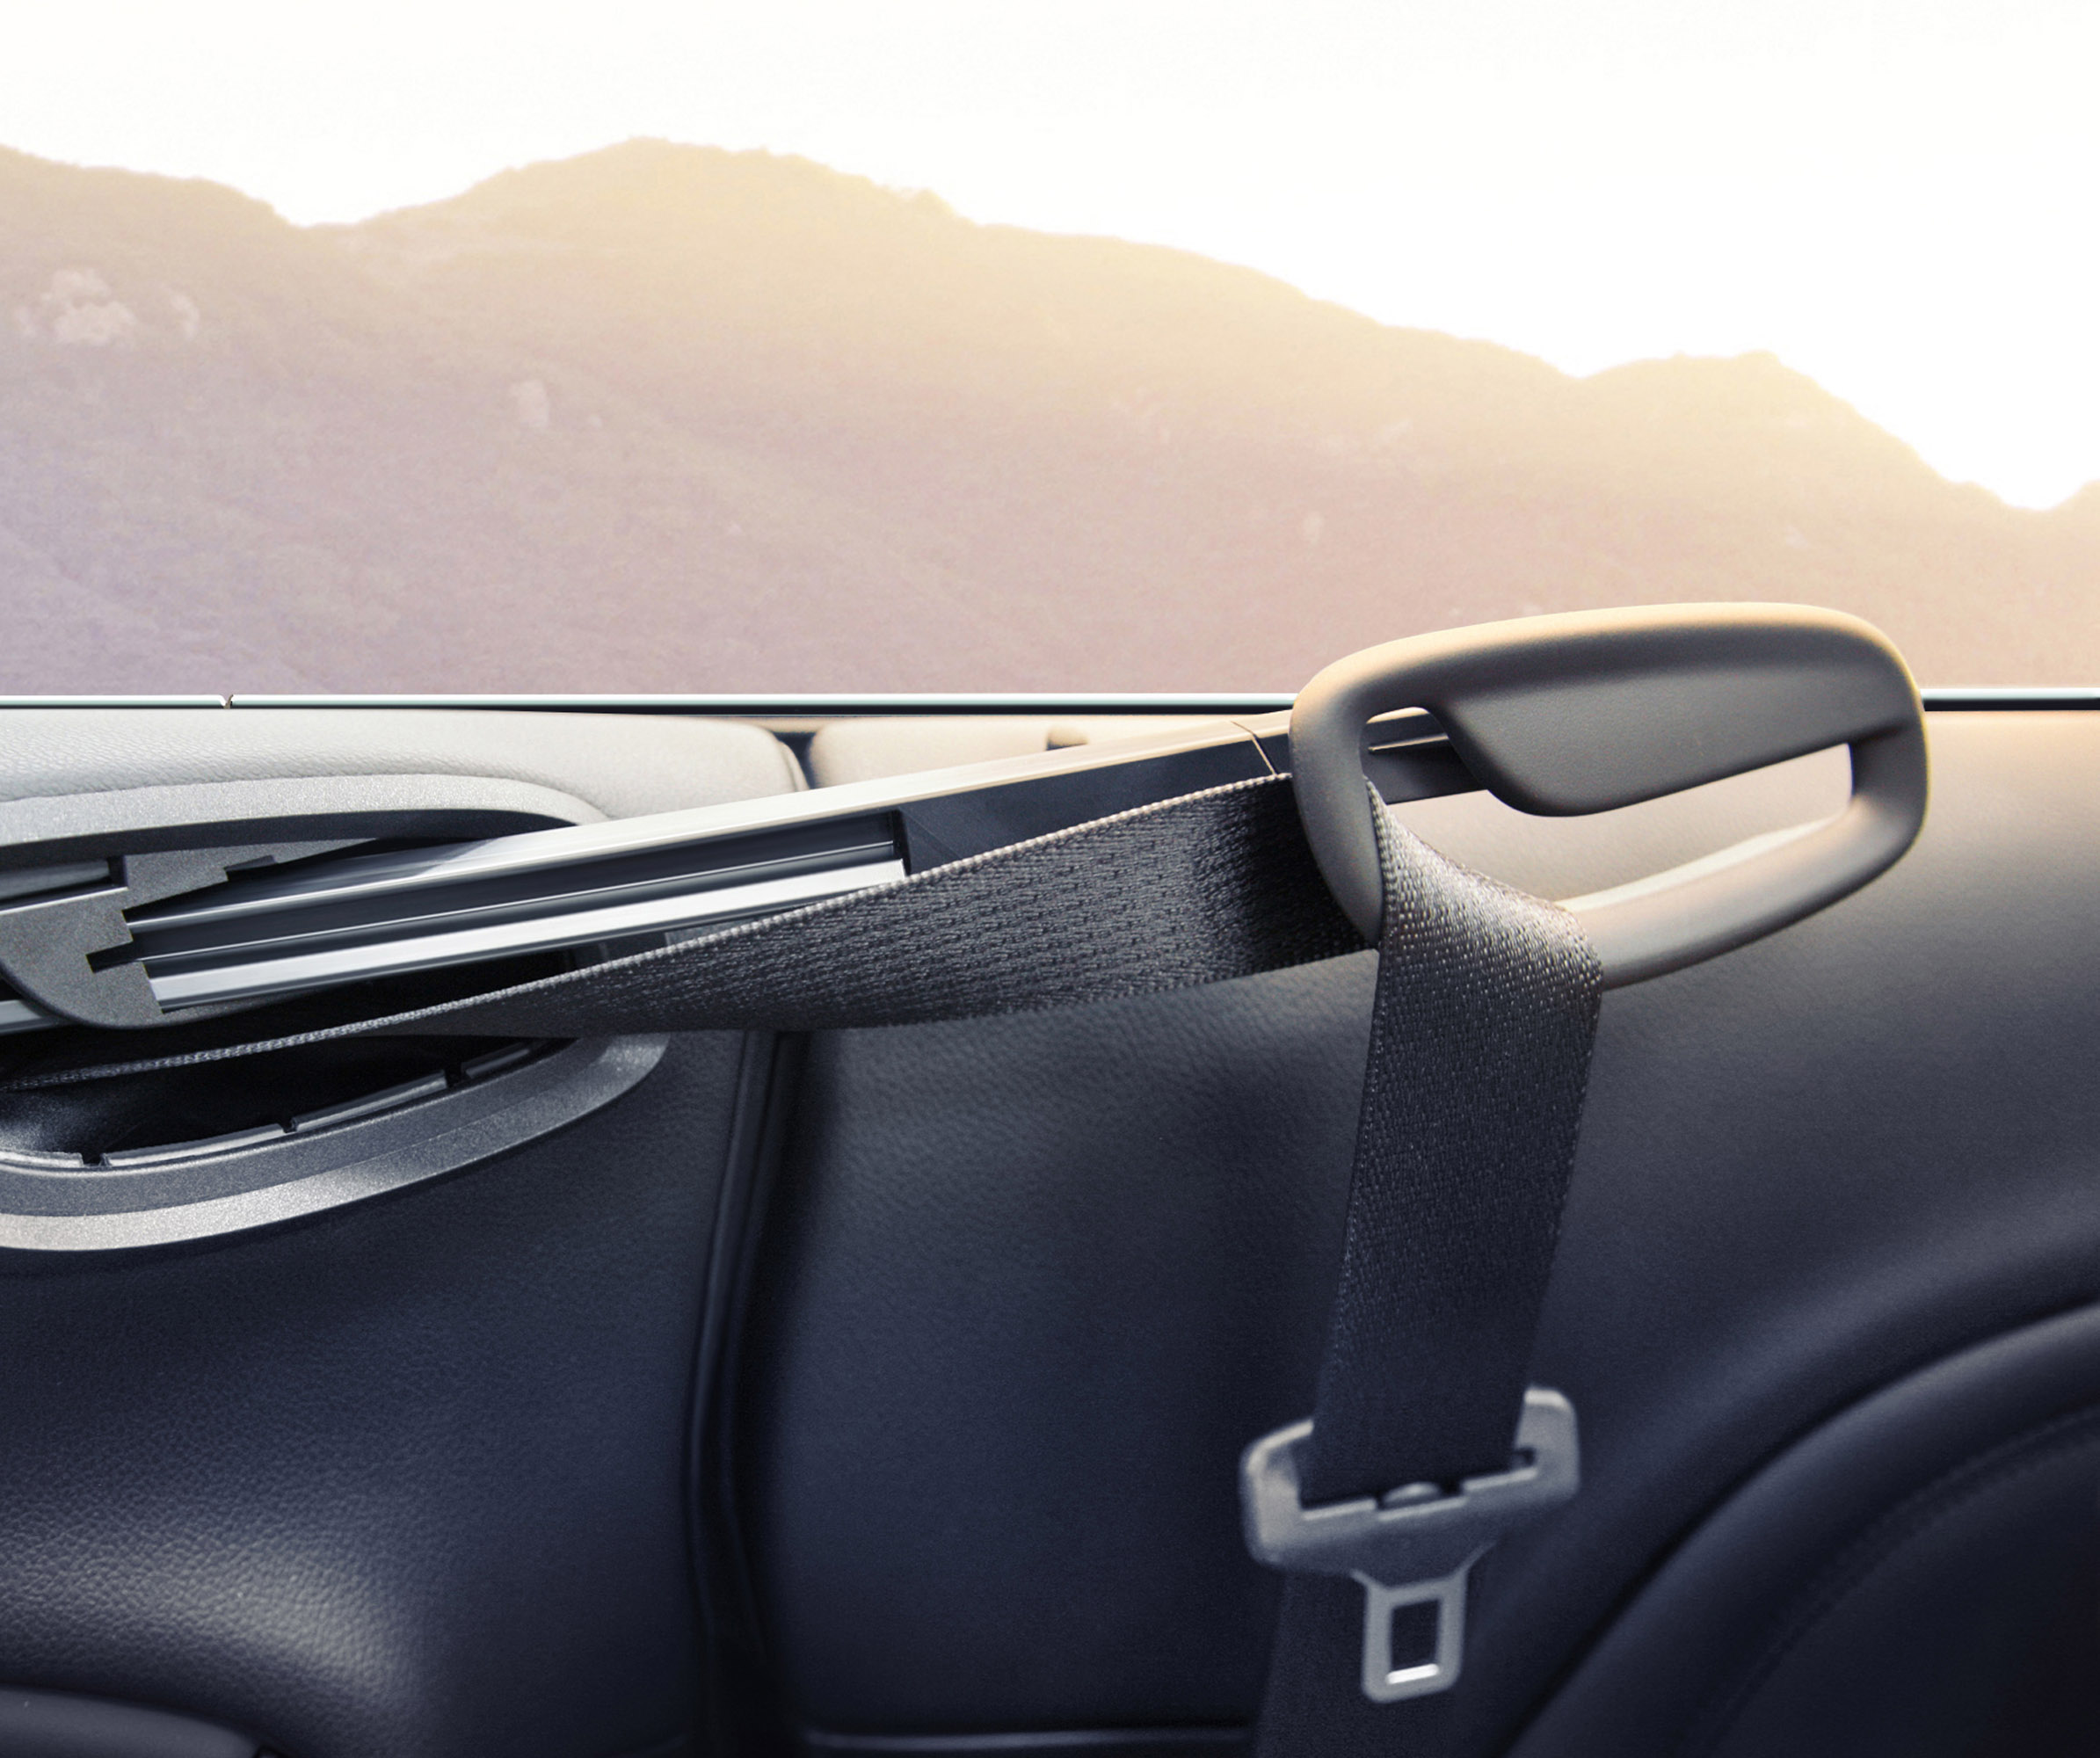 2017 Buick Cascada Review: Prior Design Mercedes-Benz CLS PD550 Black Edition